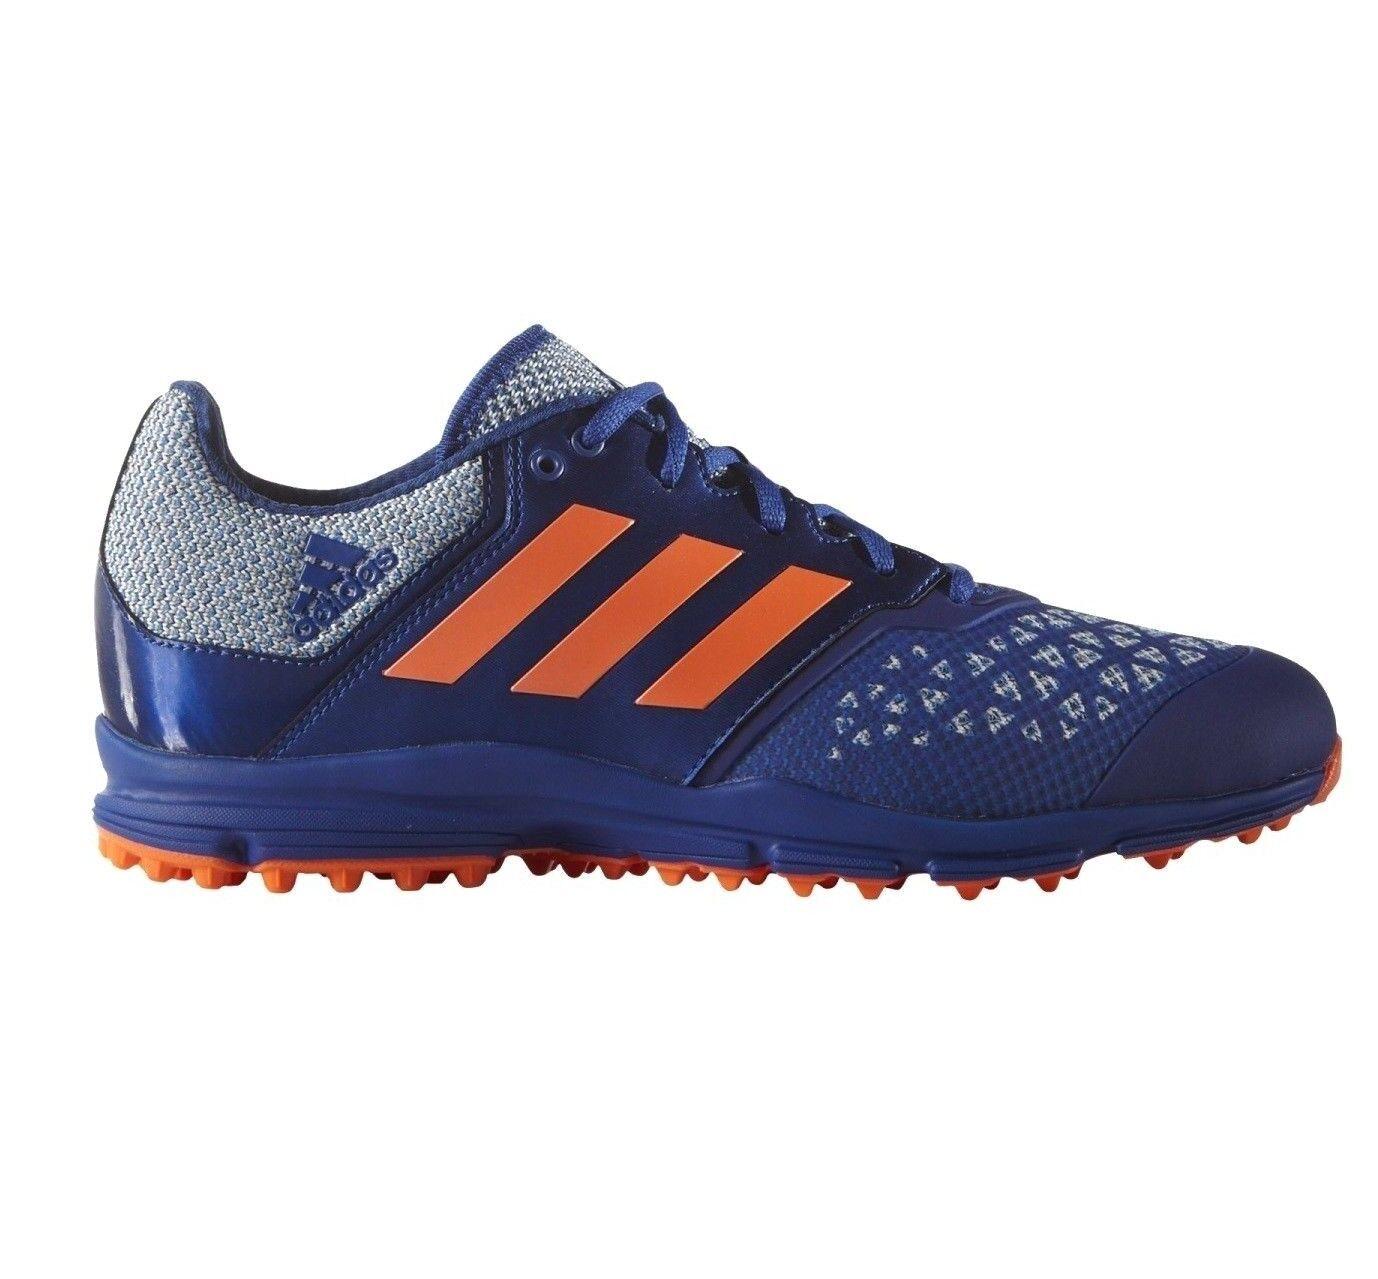 Adidas Zone Dox Hockey shoes bluee orange Trainers Cleats AQ6520 Men's Size 10